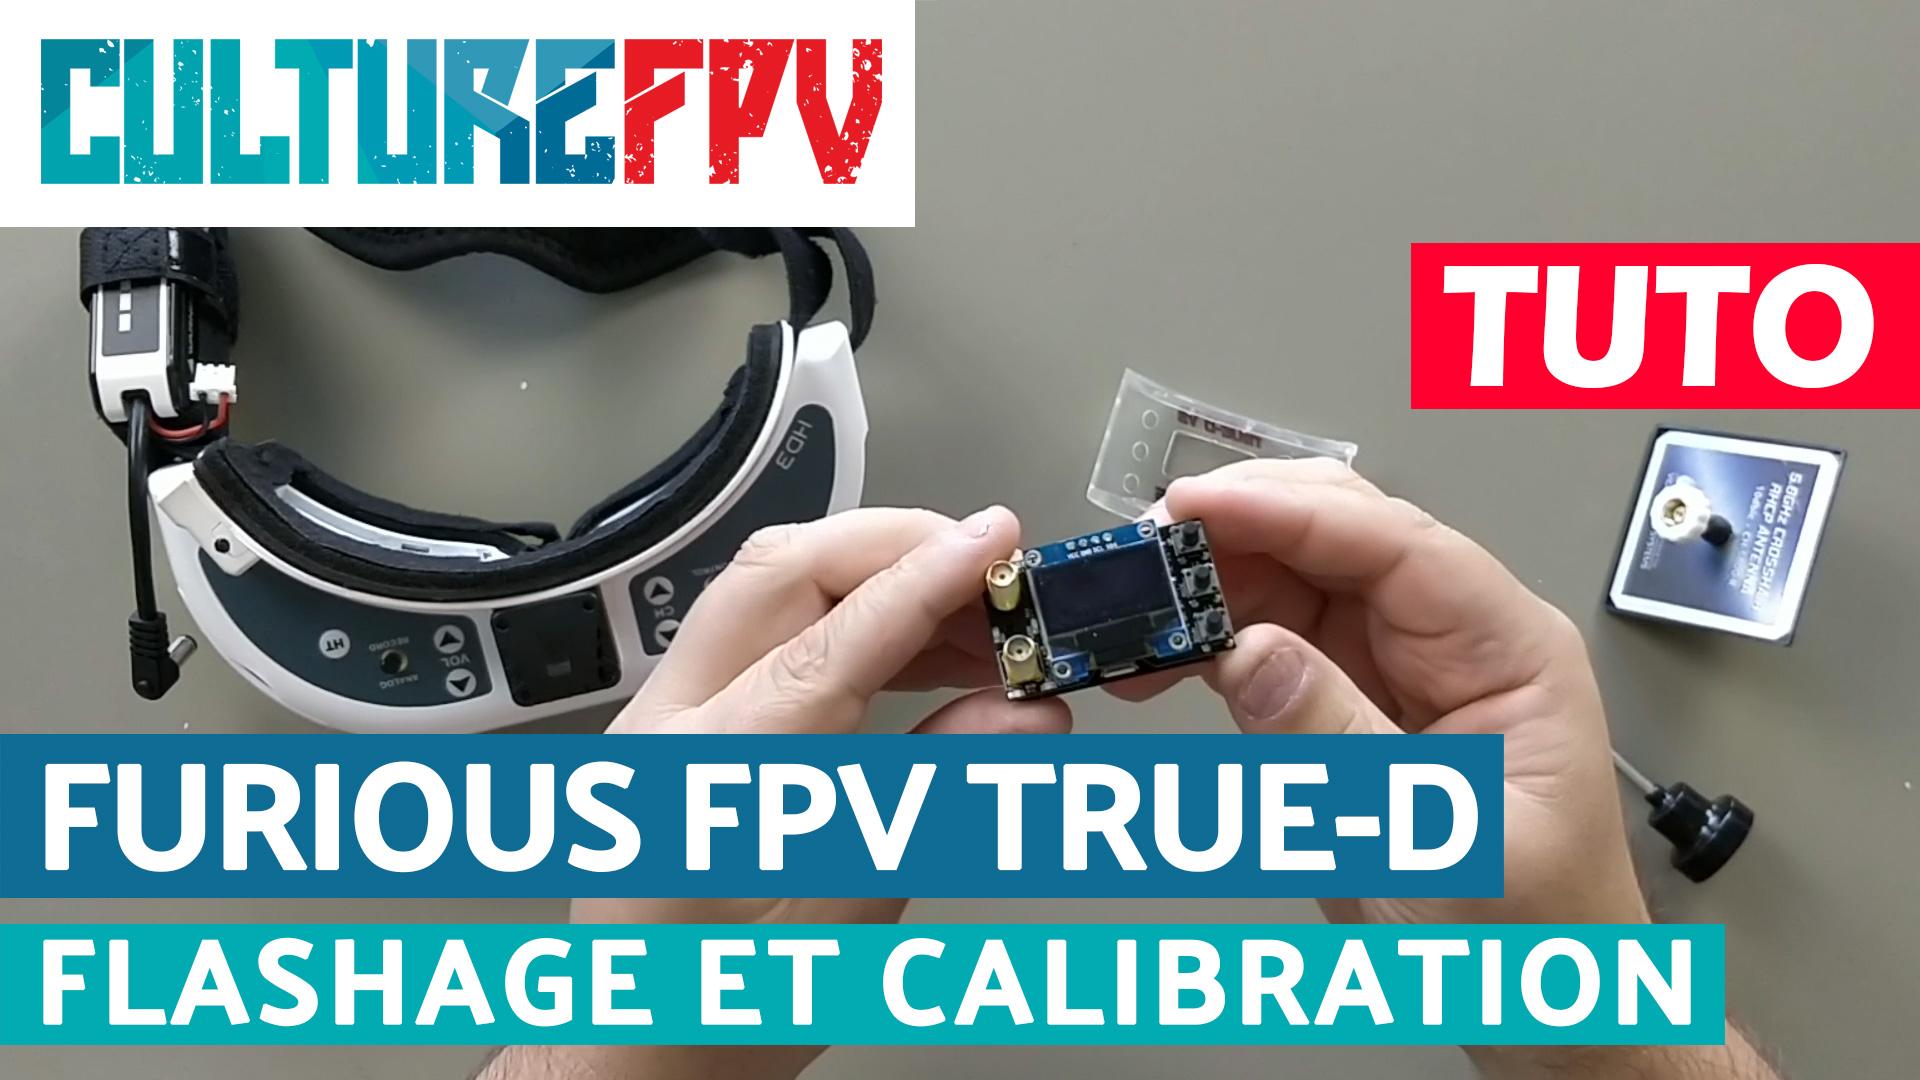 Furious FPV True-D